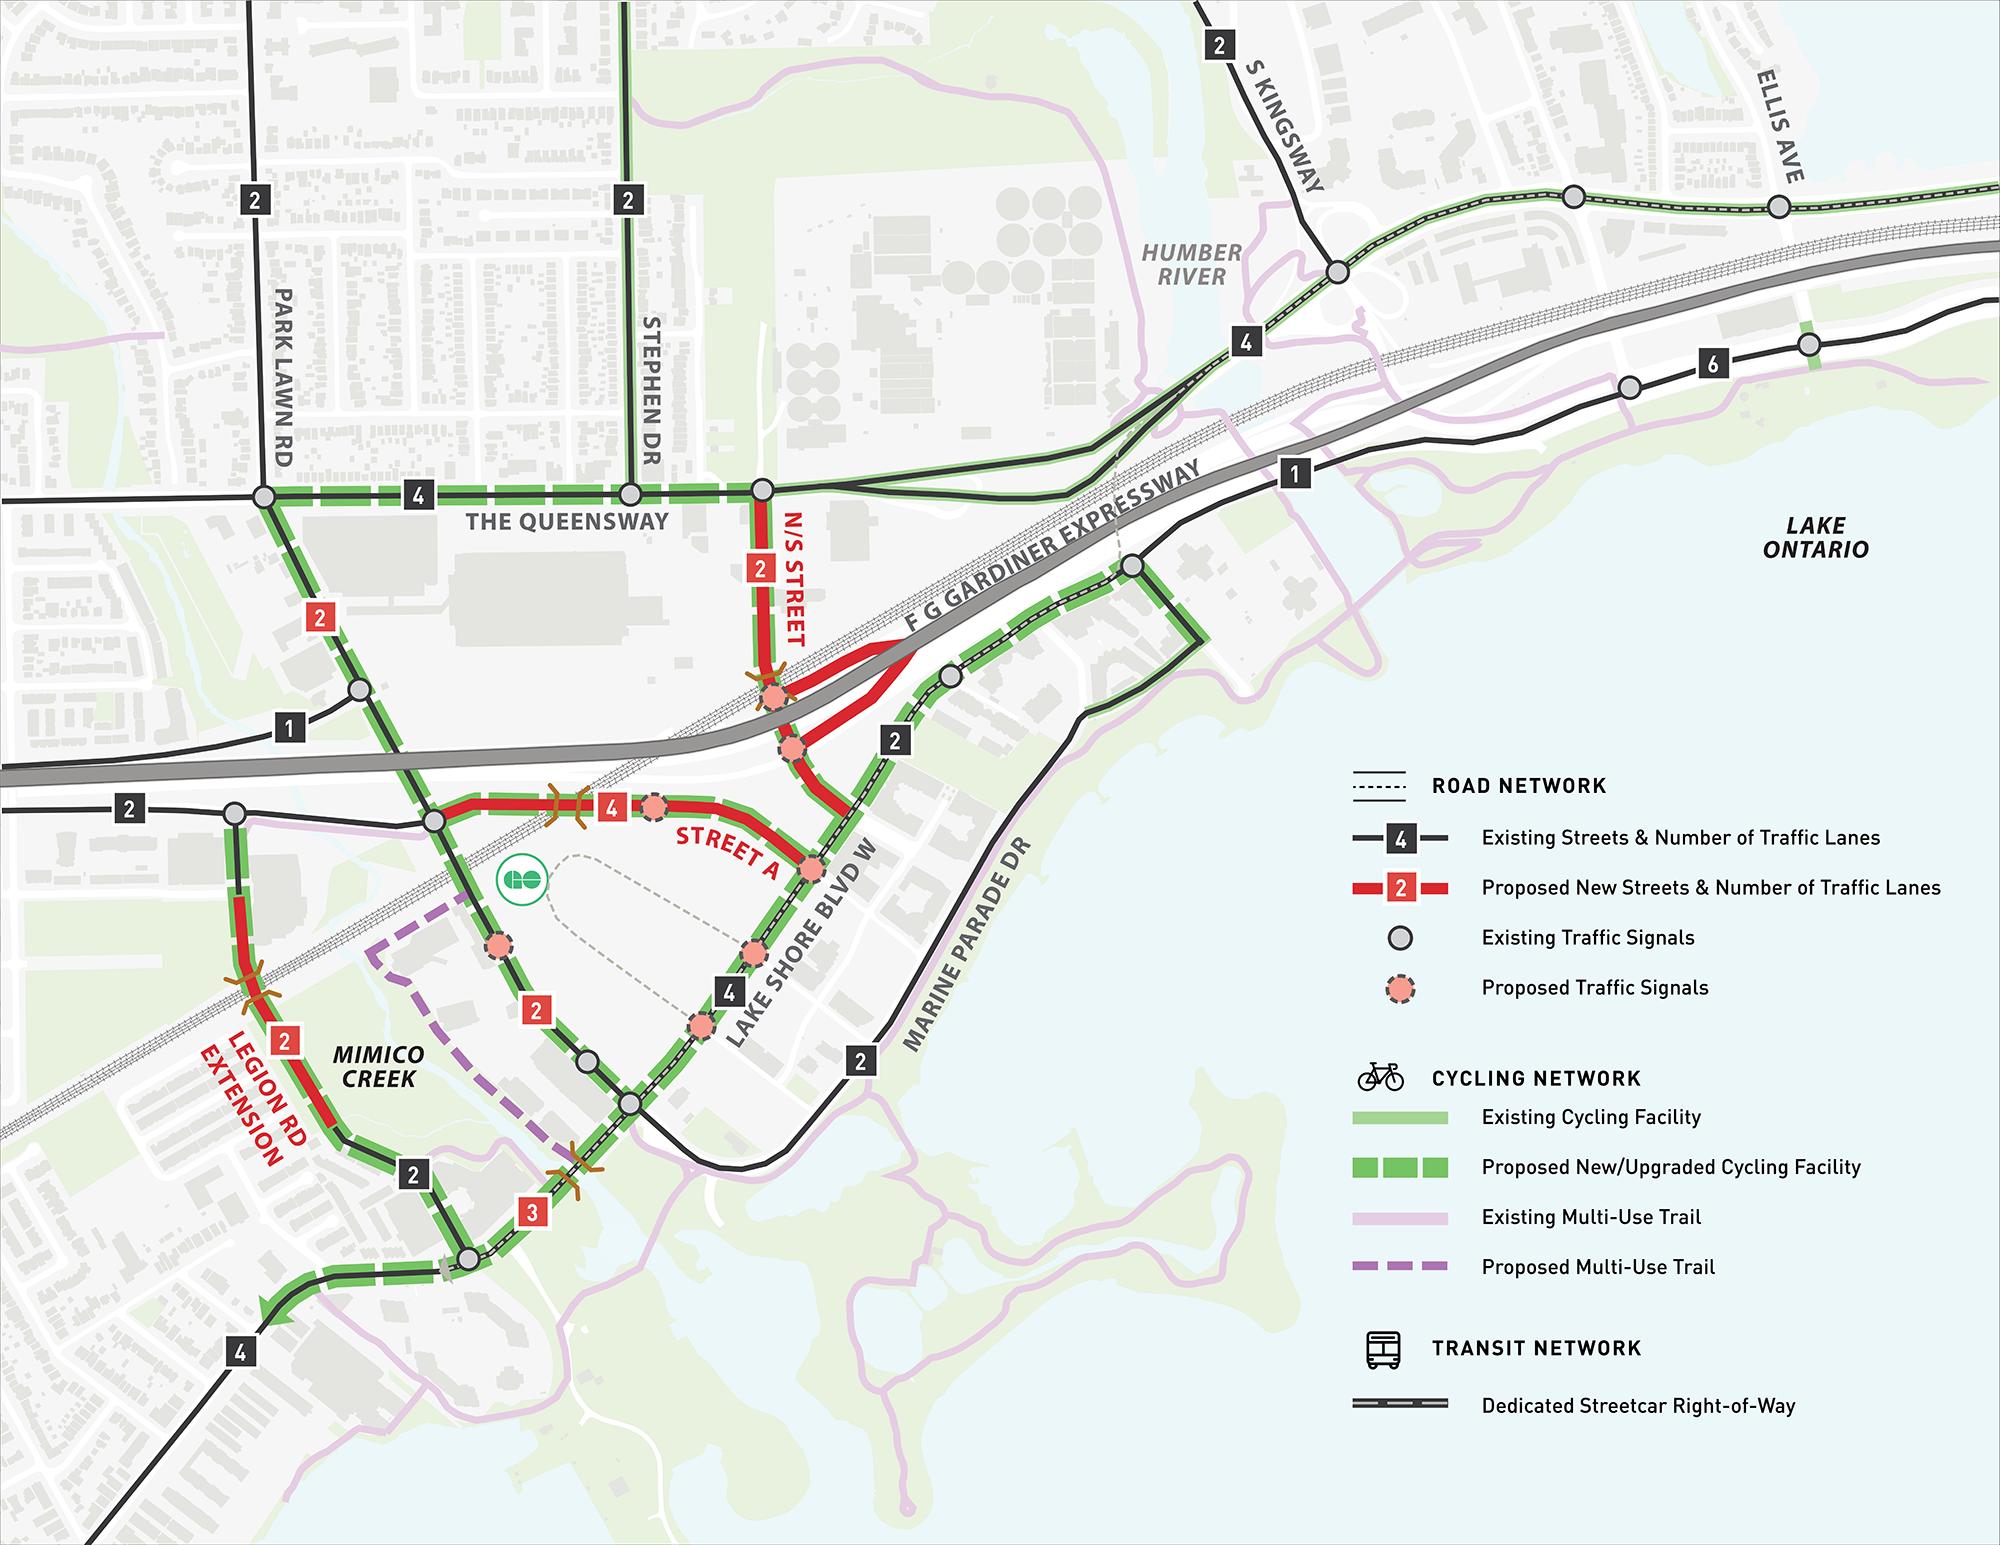 Park Lawn Lake Shore Transportation Master Plan Network Alternative 4B Neighbourhood Main Streets with 4-lane Lake Shore